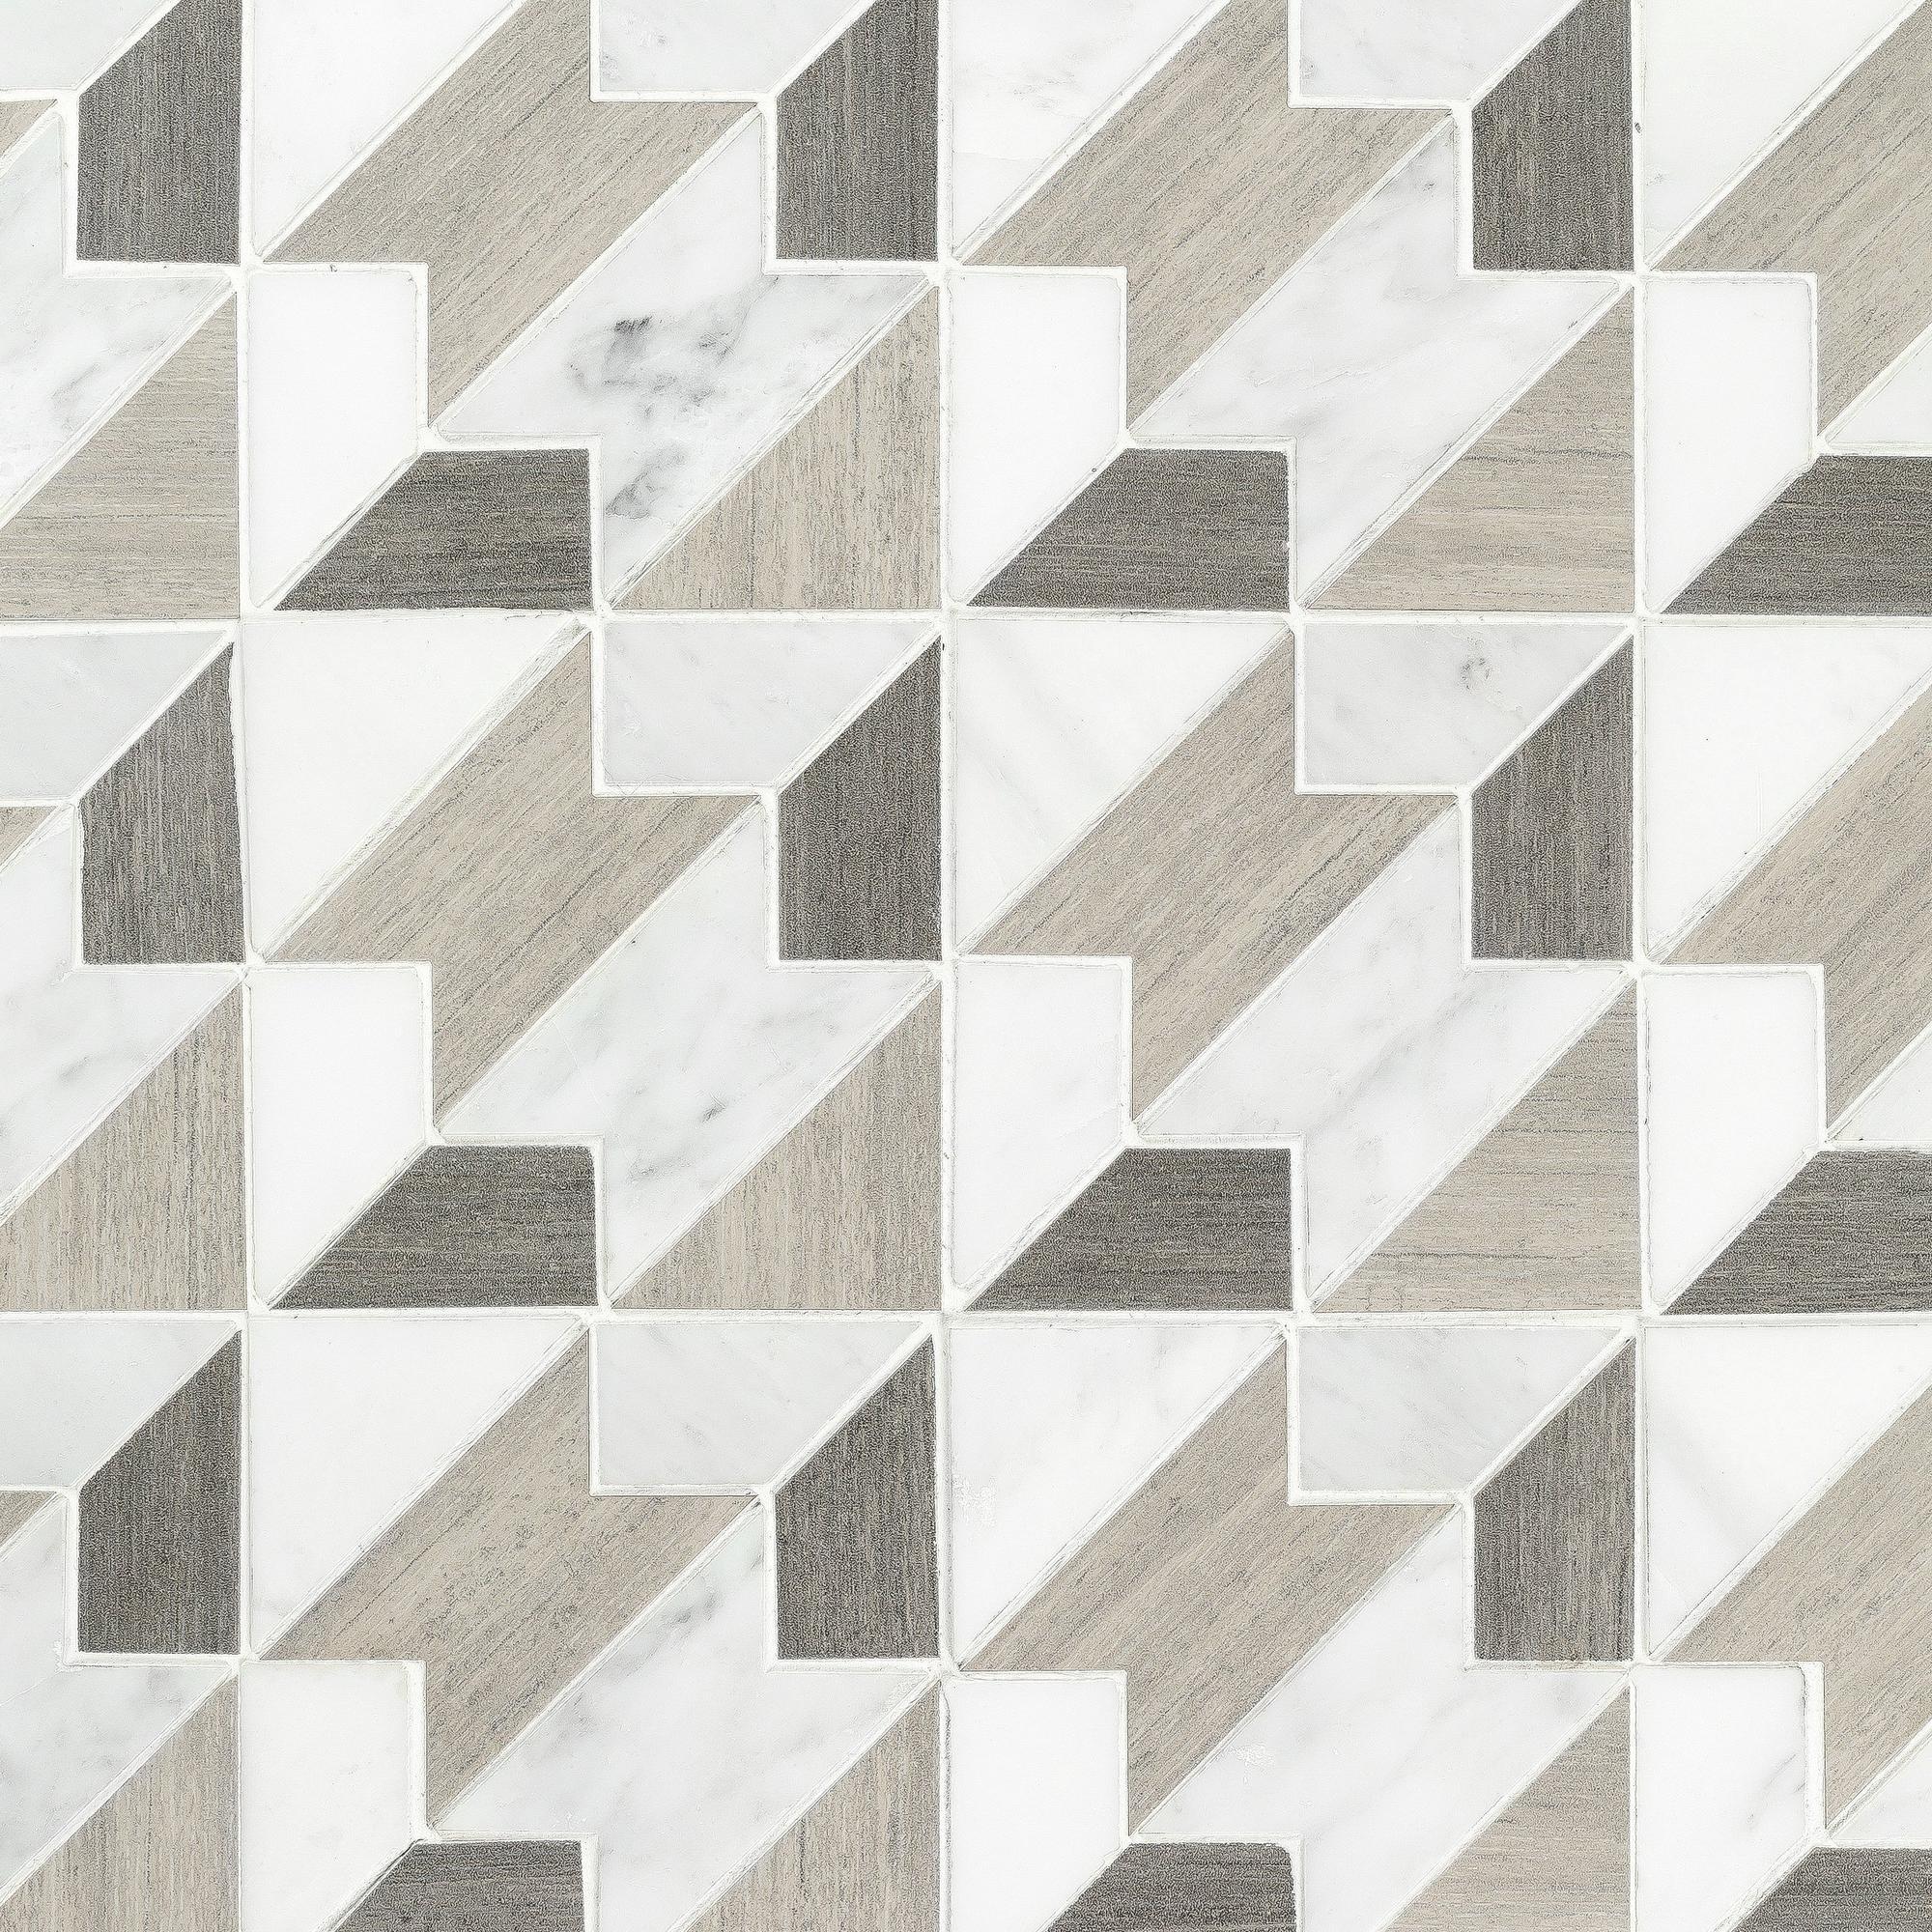 Floor & Decor | Viviano Marmo Houndstooth Carrara Blend Marble Mosaic